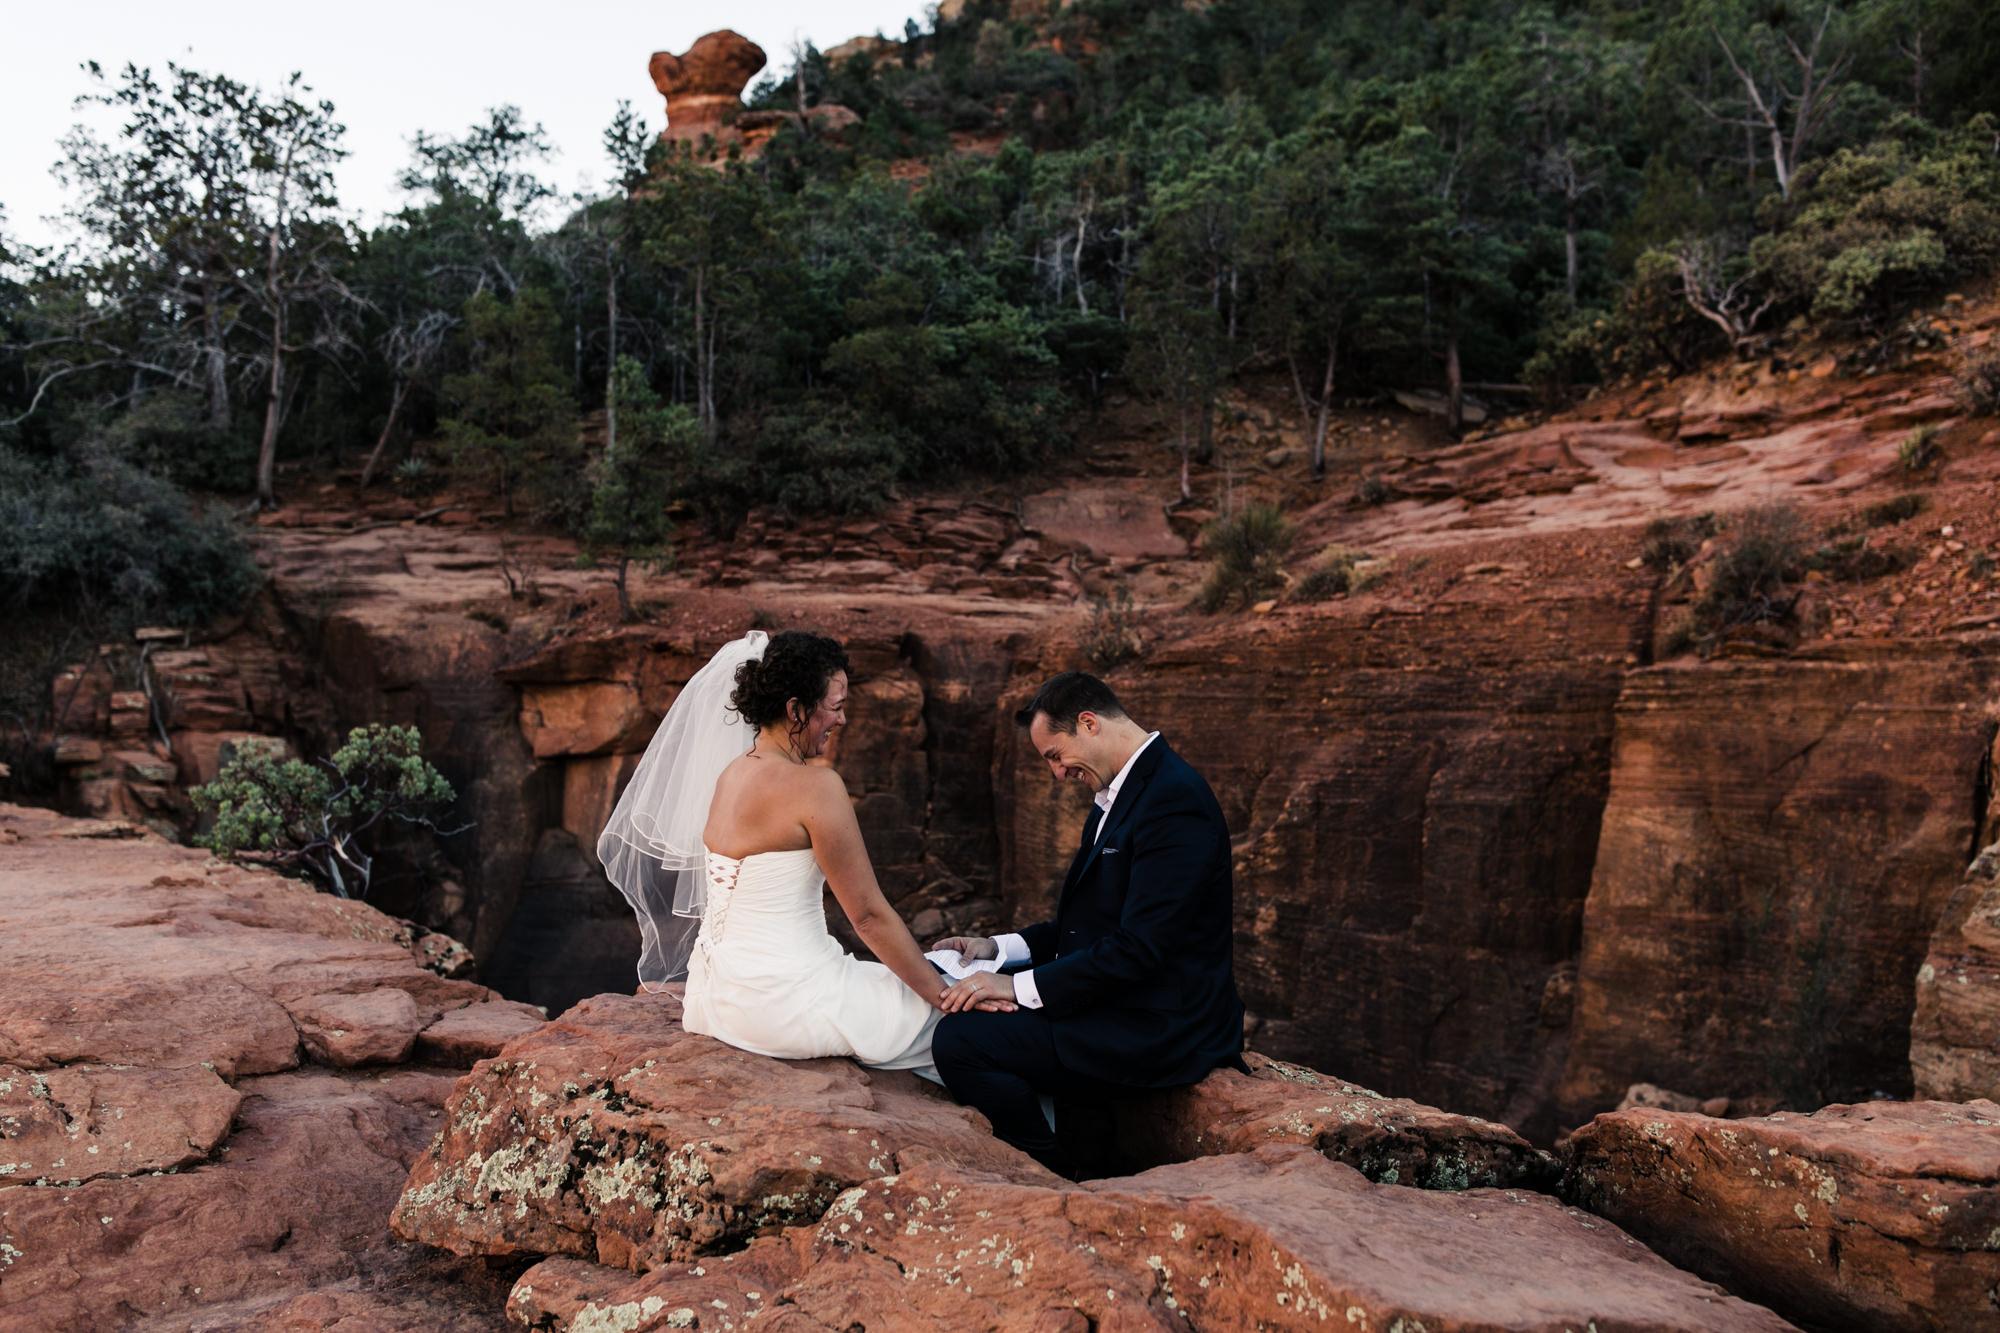 adventure elopement in sedona, arizona   travel destination wedding photographers   the hearnes adventure photography   www.thehearnes.com